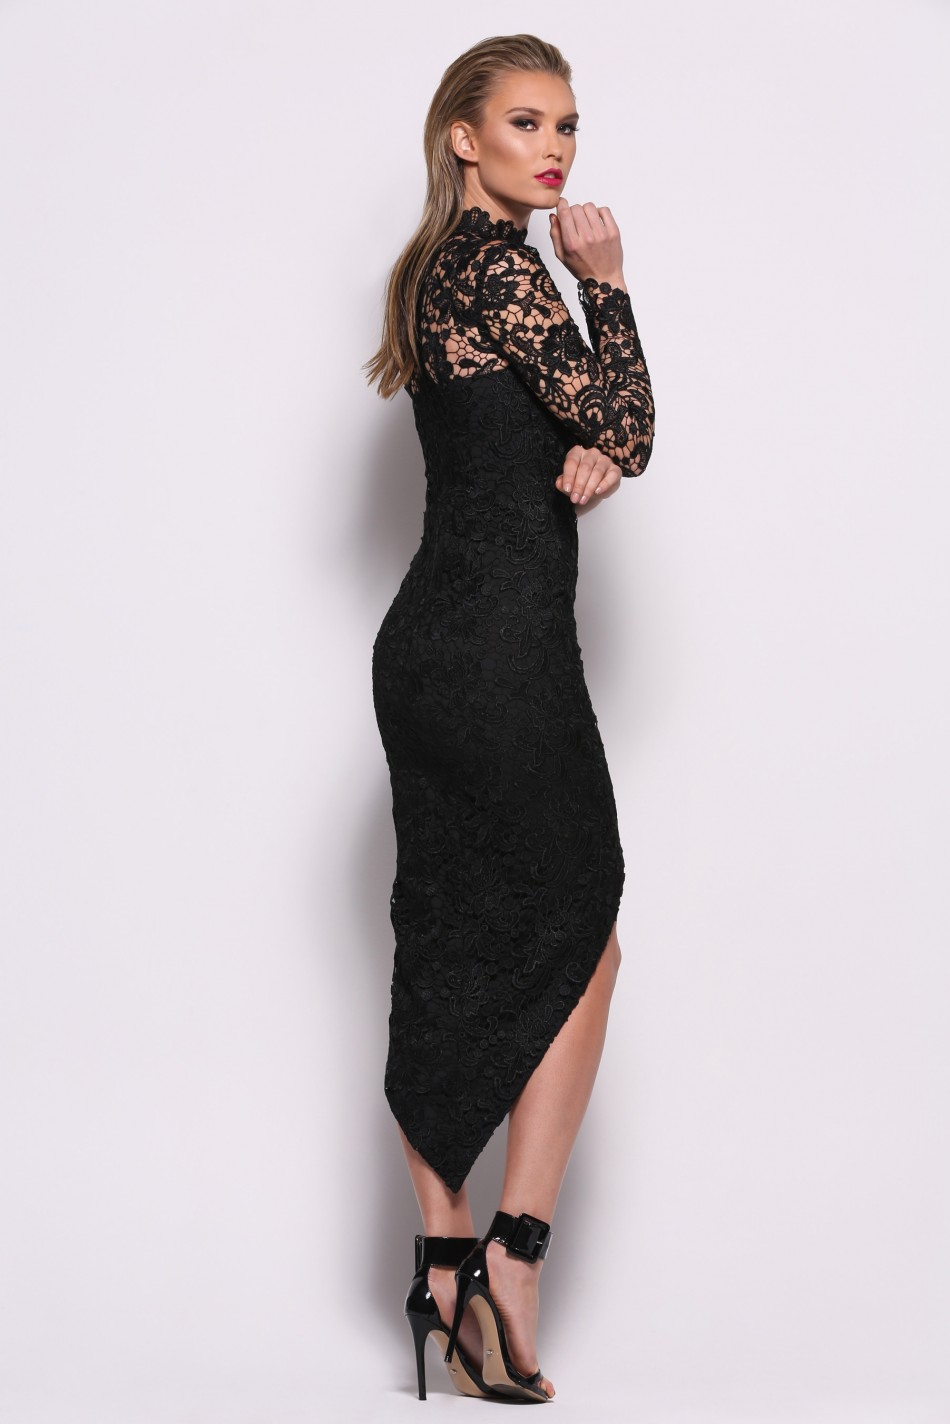 Saba Black Dress By Elle Zeitoune